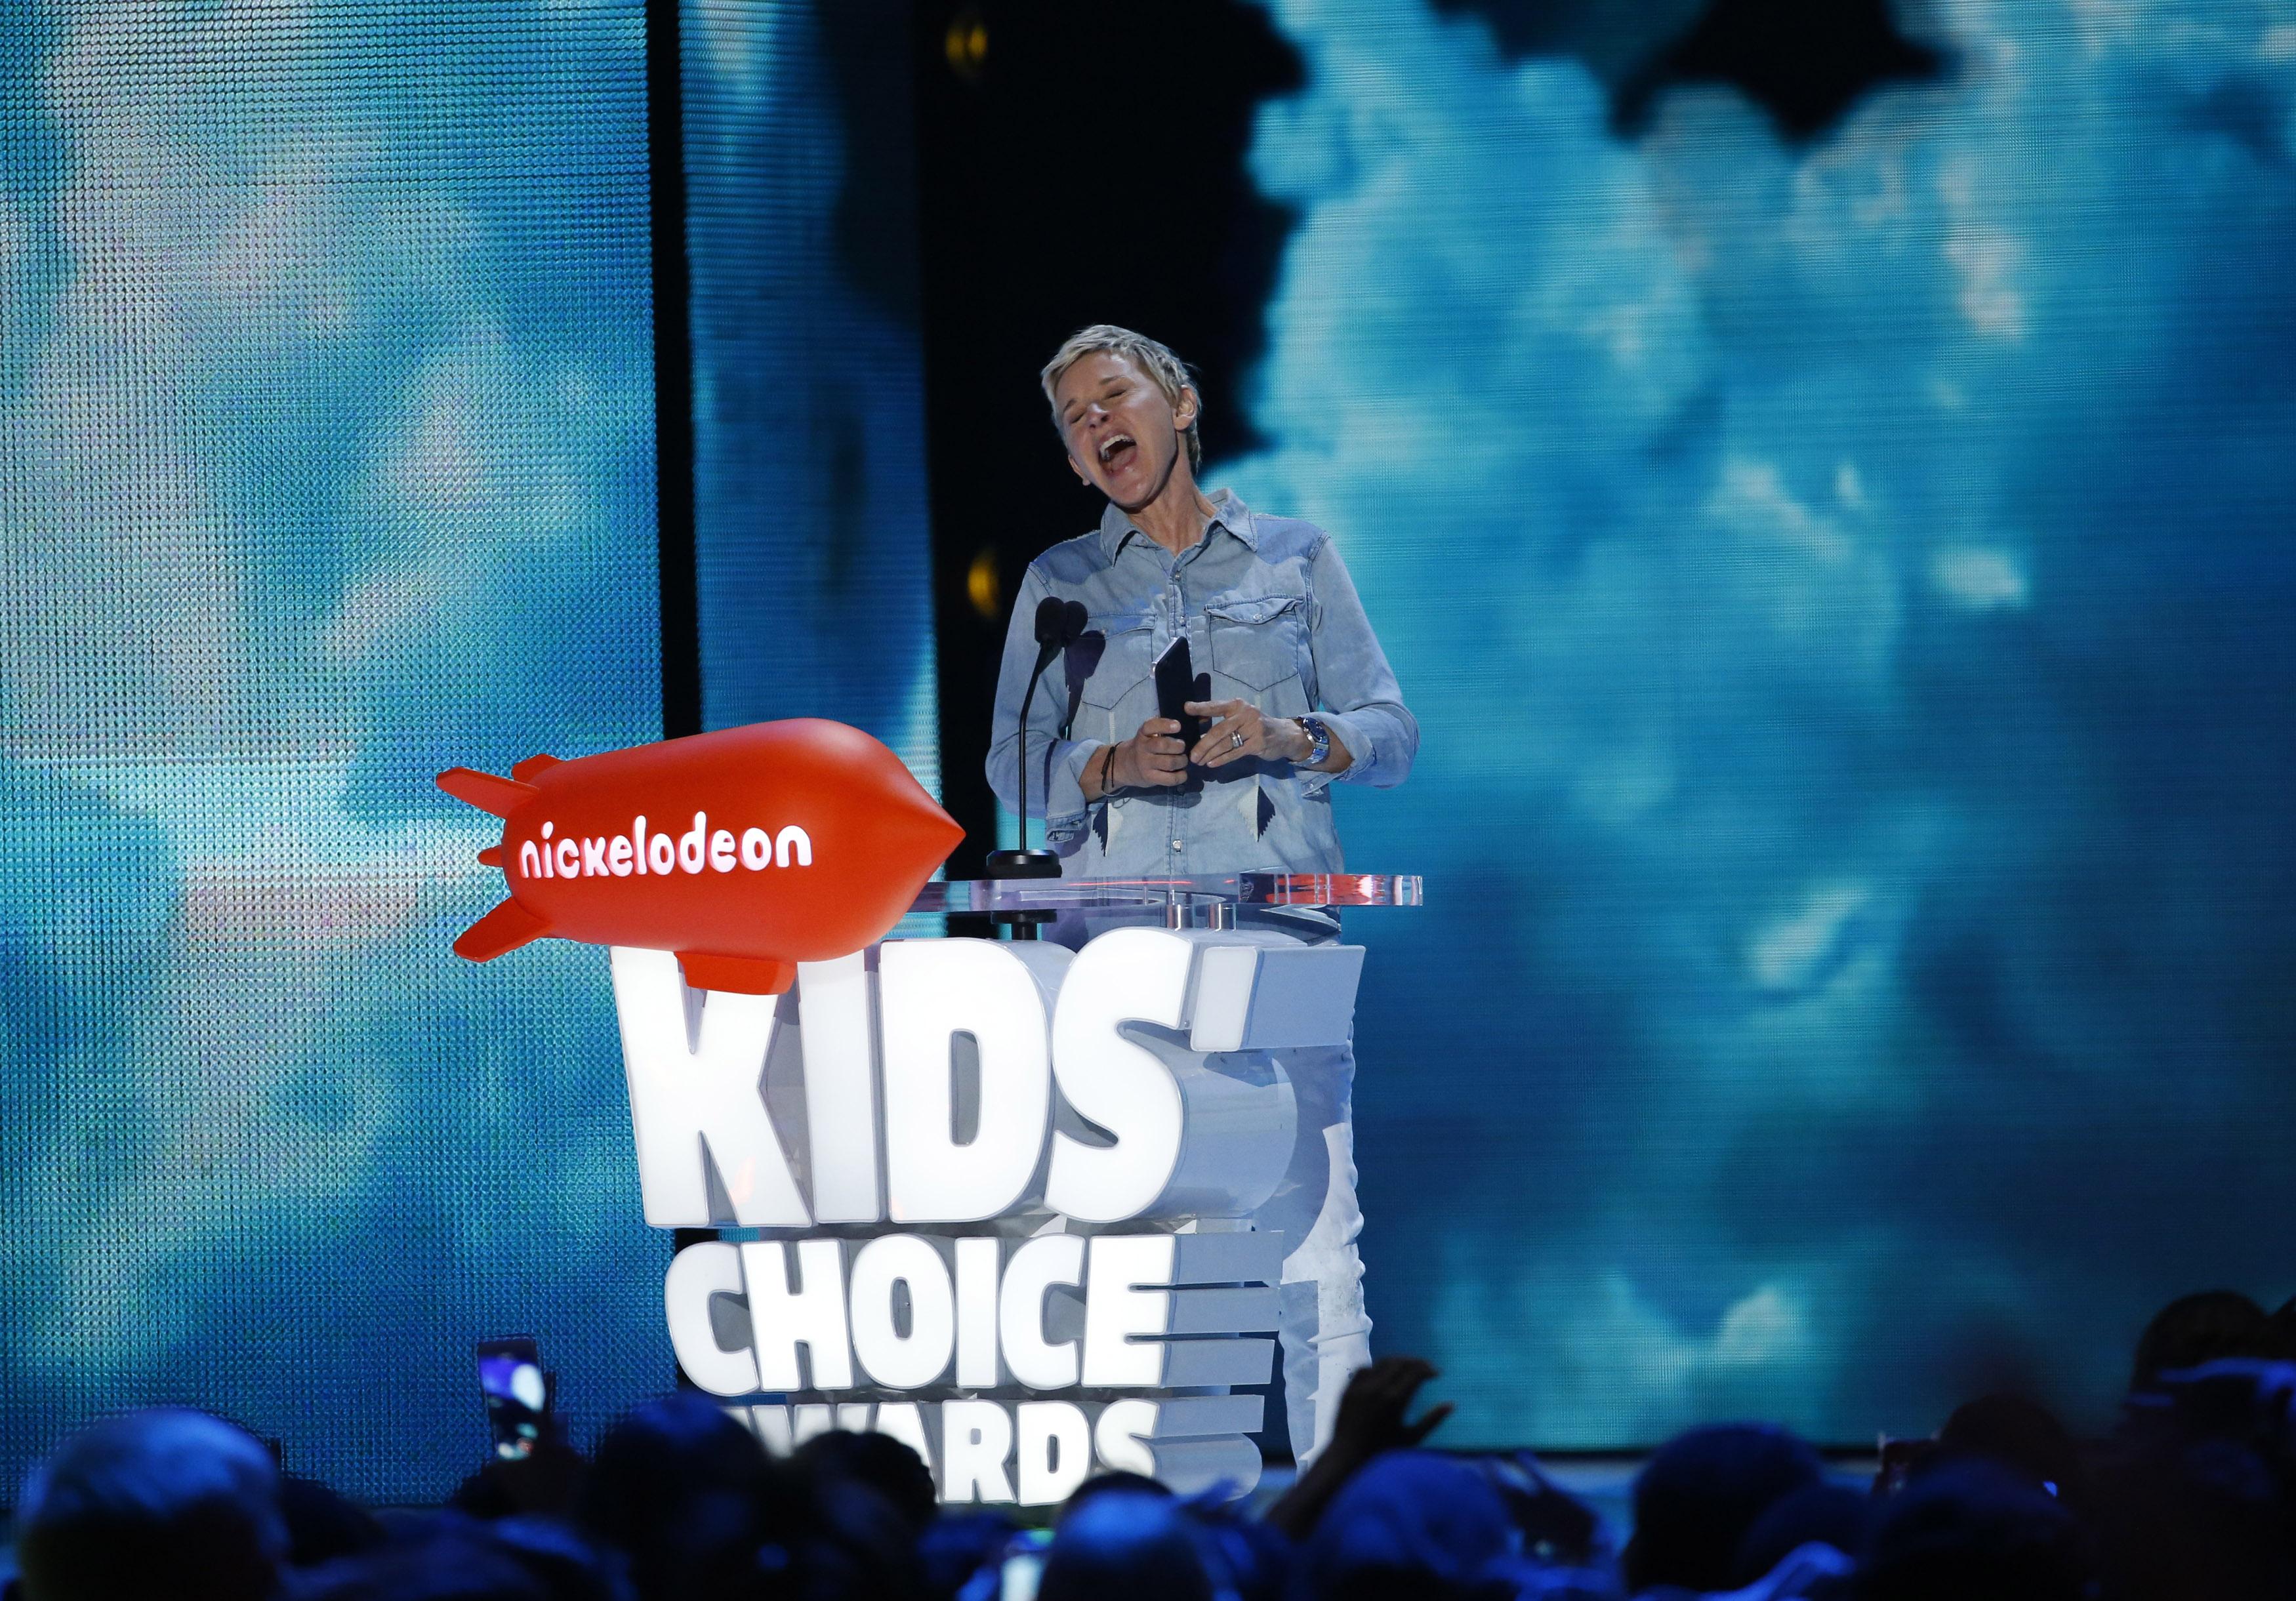 Nickelodeon and Cartoon Network's kid shows, Legend of Korra, Hey